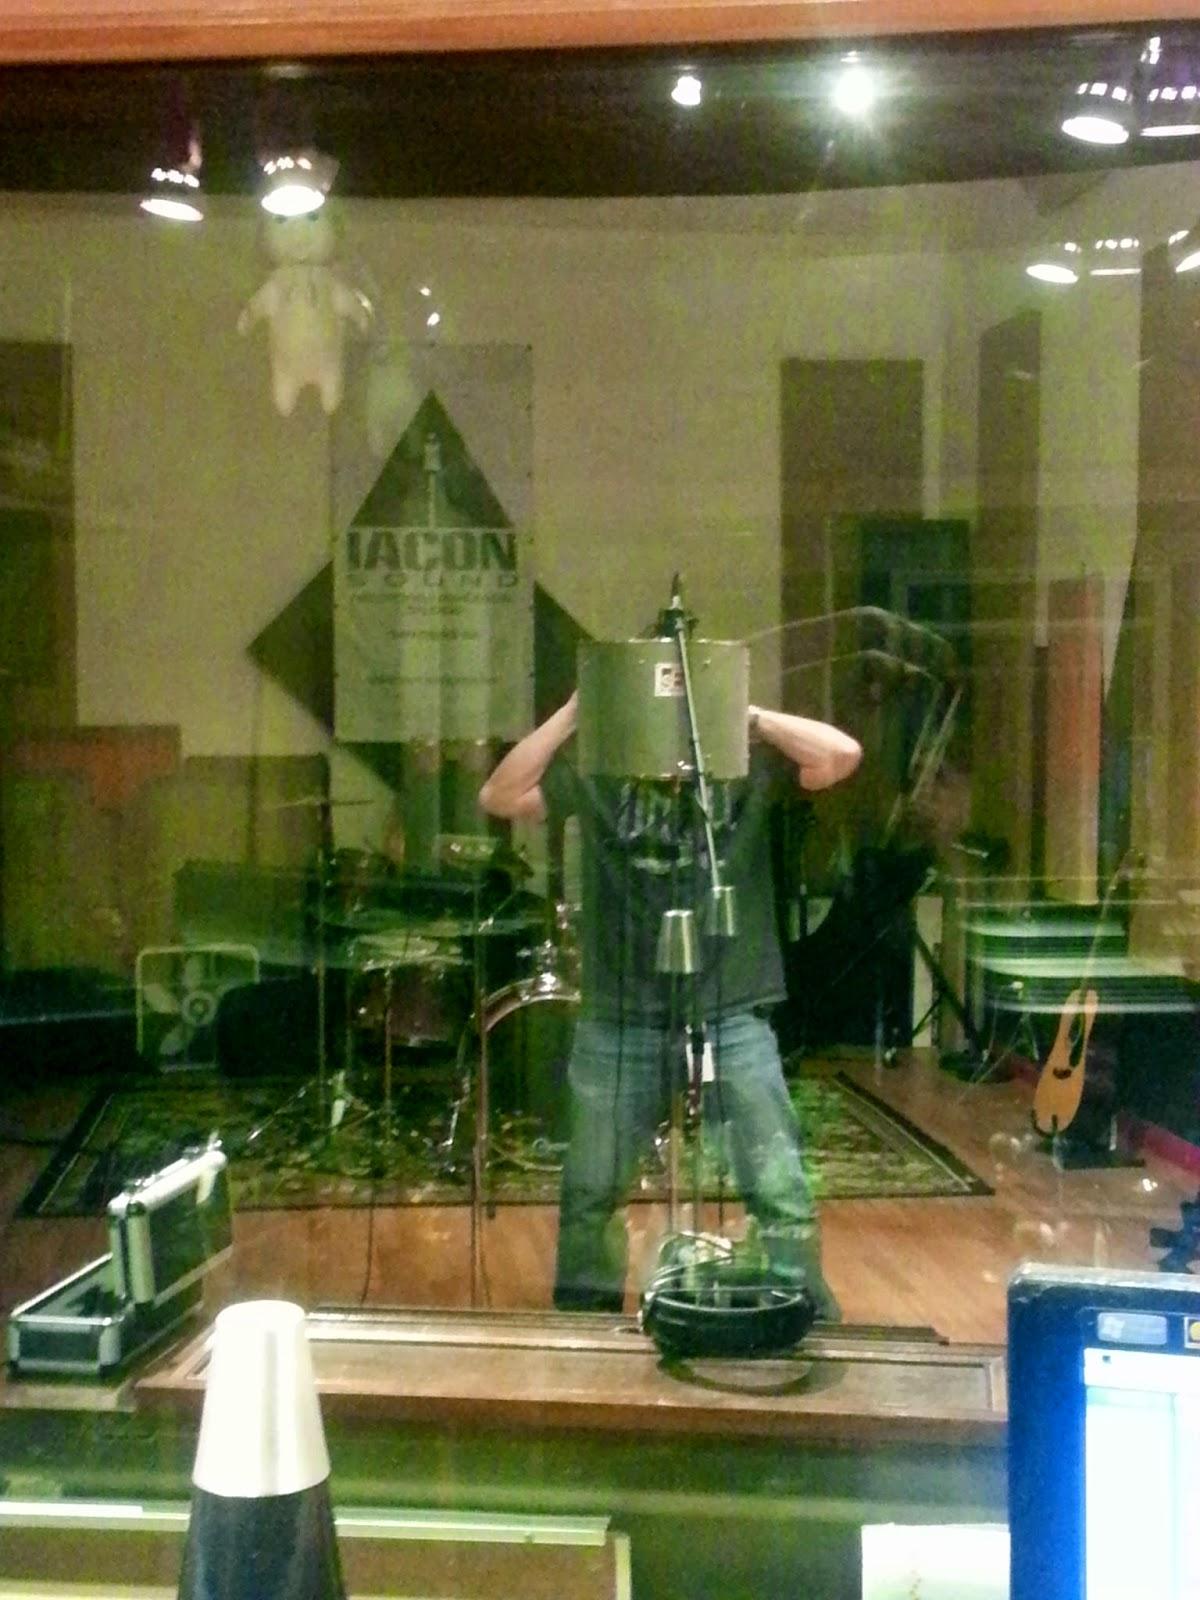 Trenton Blizzard - Tracking Vocals at Iacon Sound Studio - San Diego